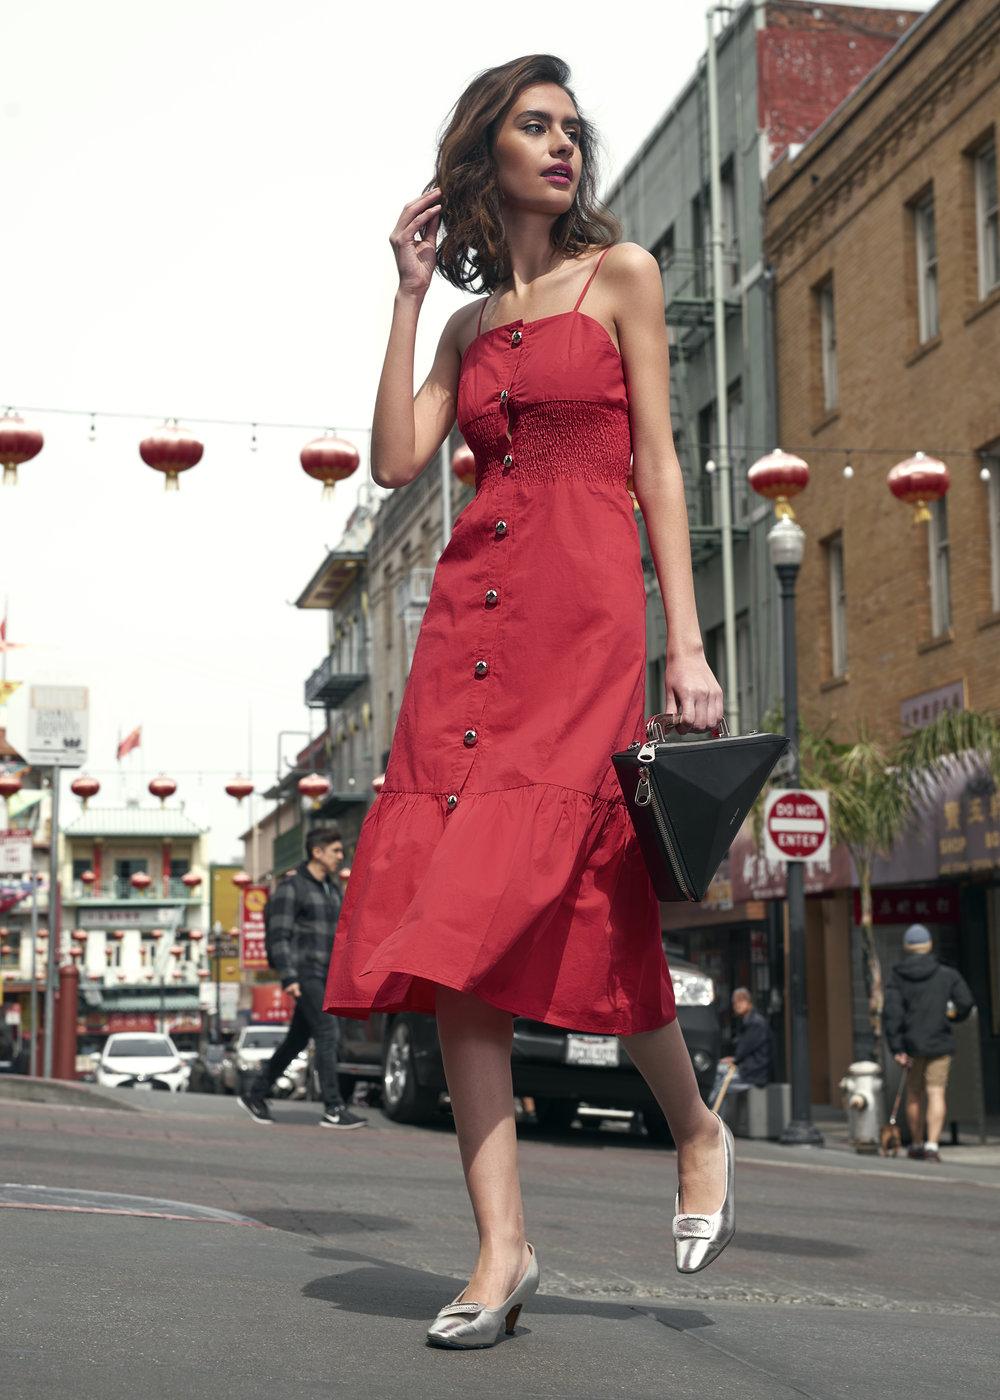 Dress and handbag by Nika Tang, shoes by Wallflower SF.